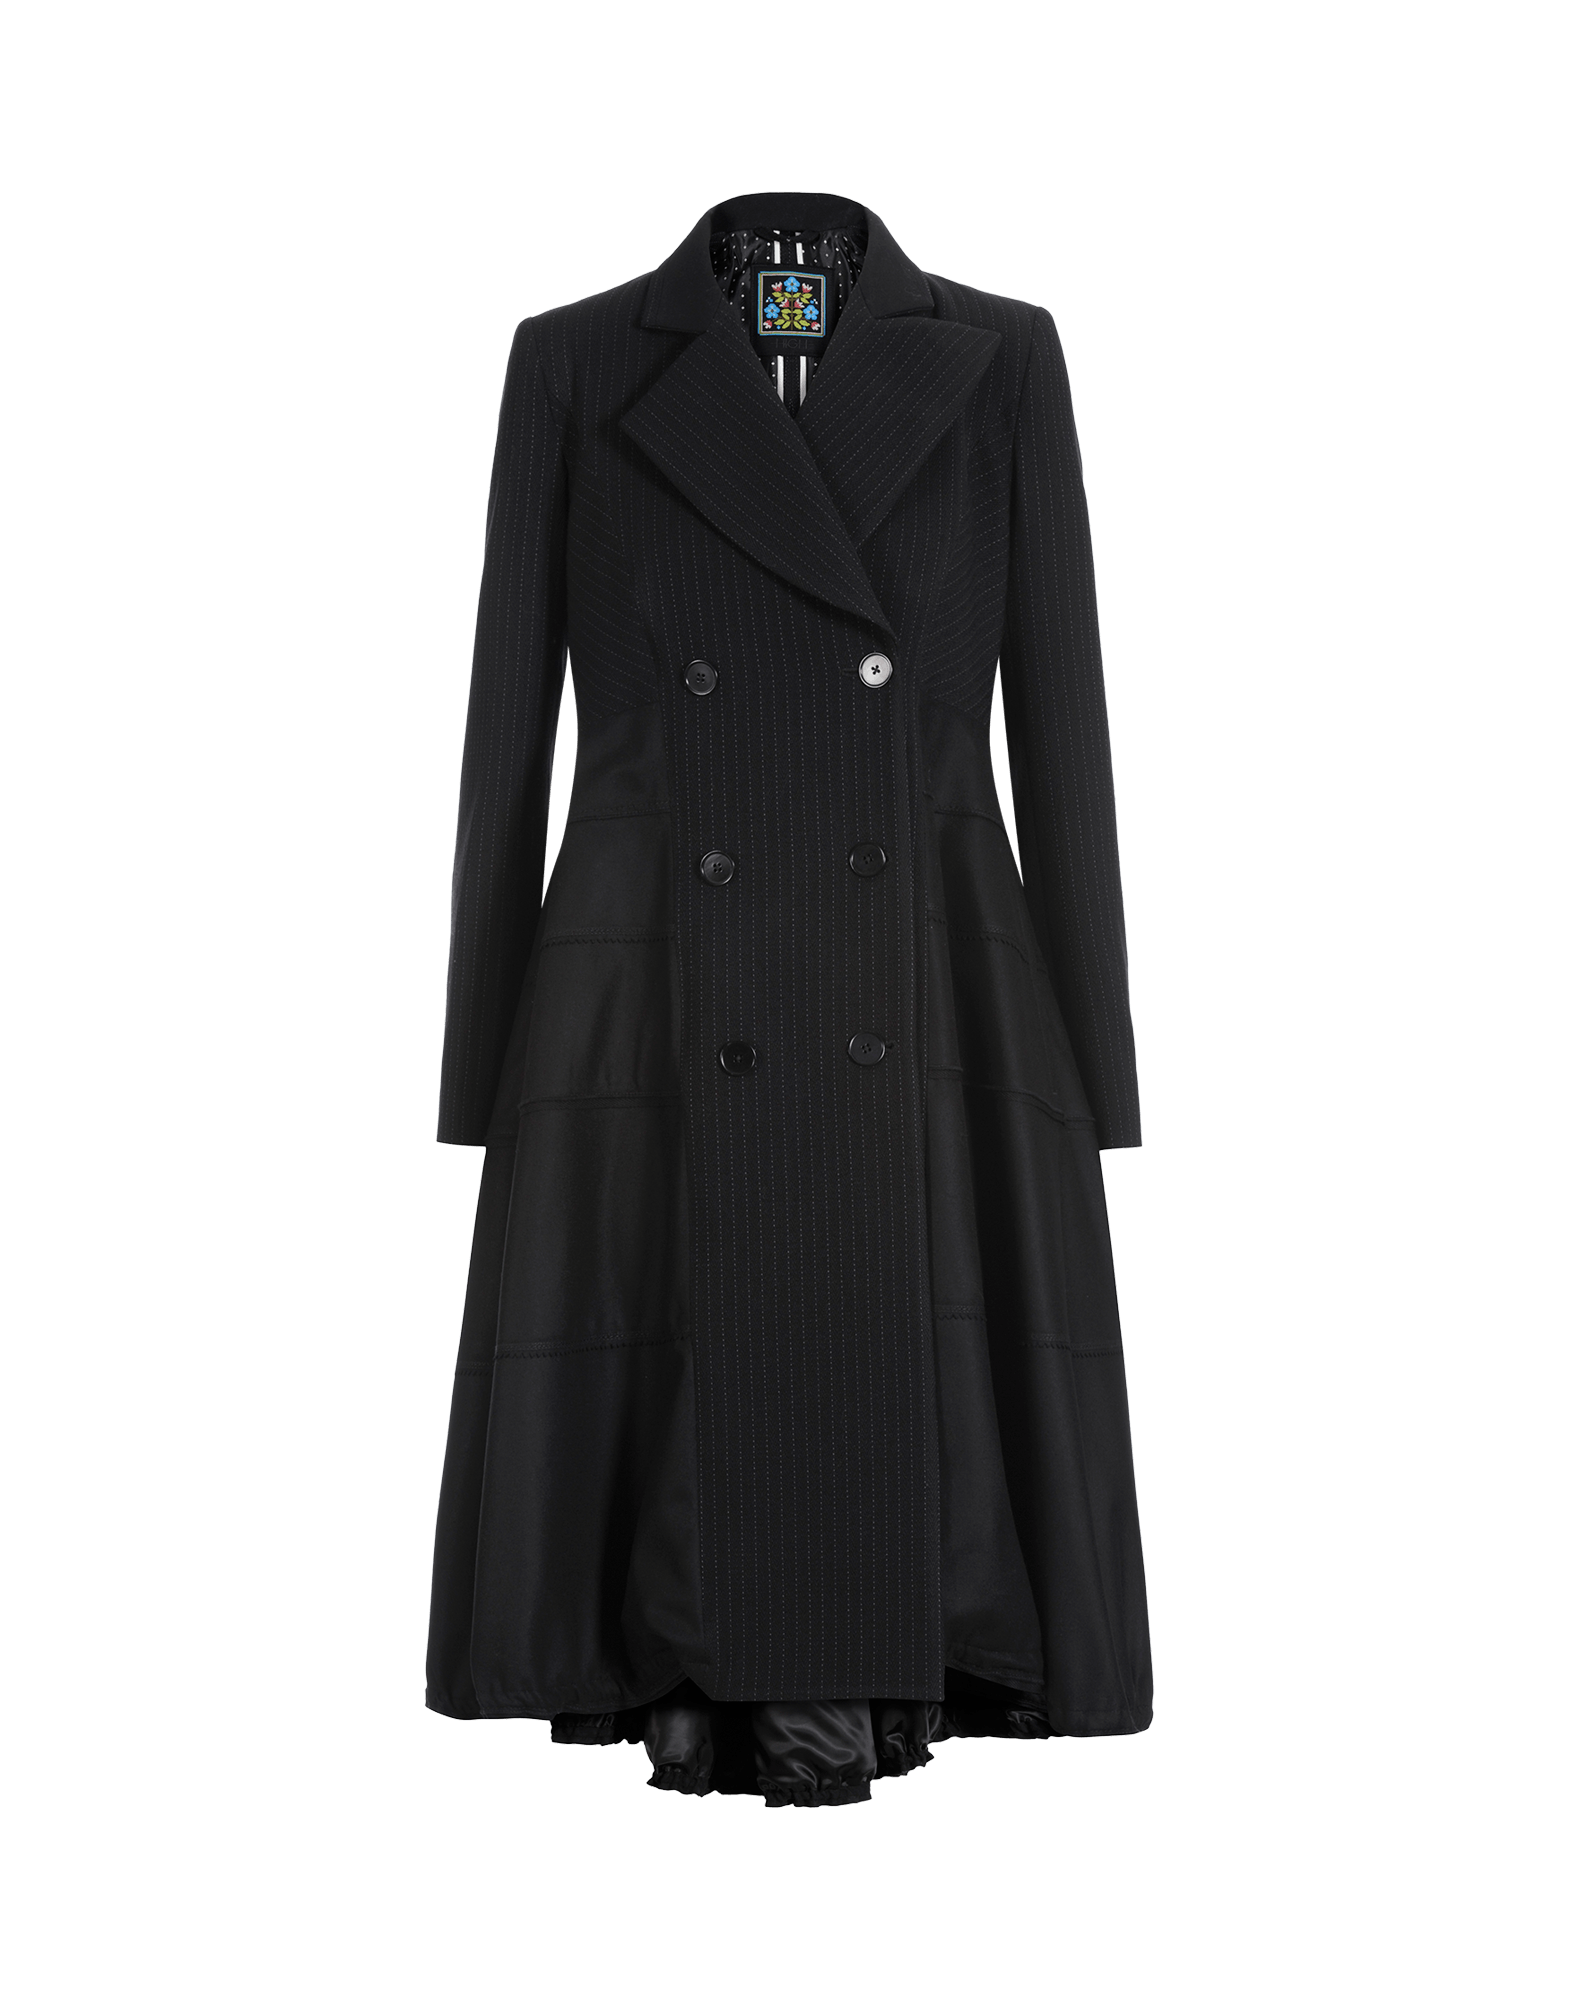 Lange Mantel Aus Wollkaschmirflanell